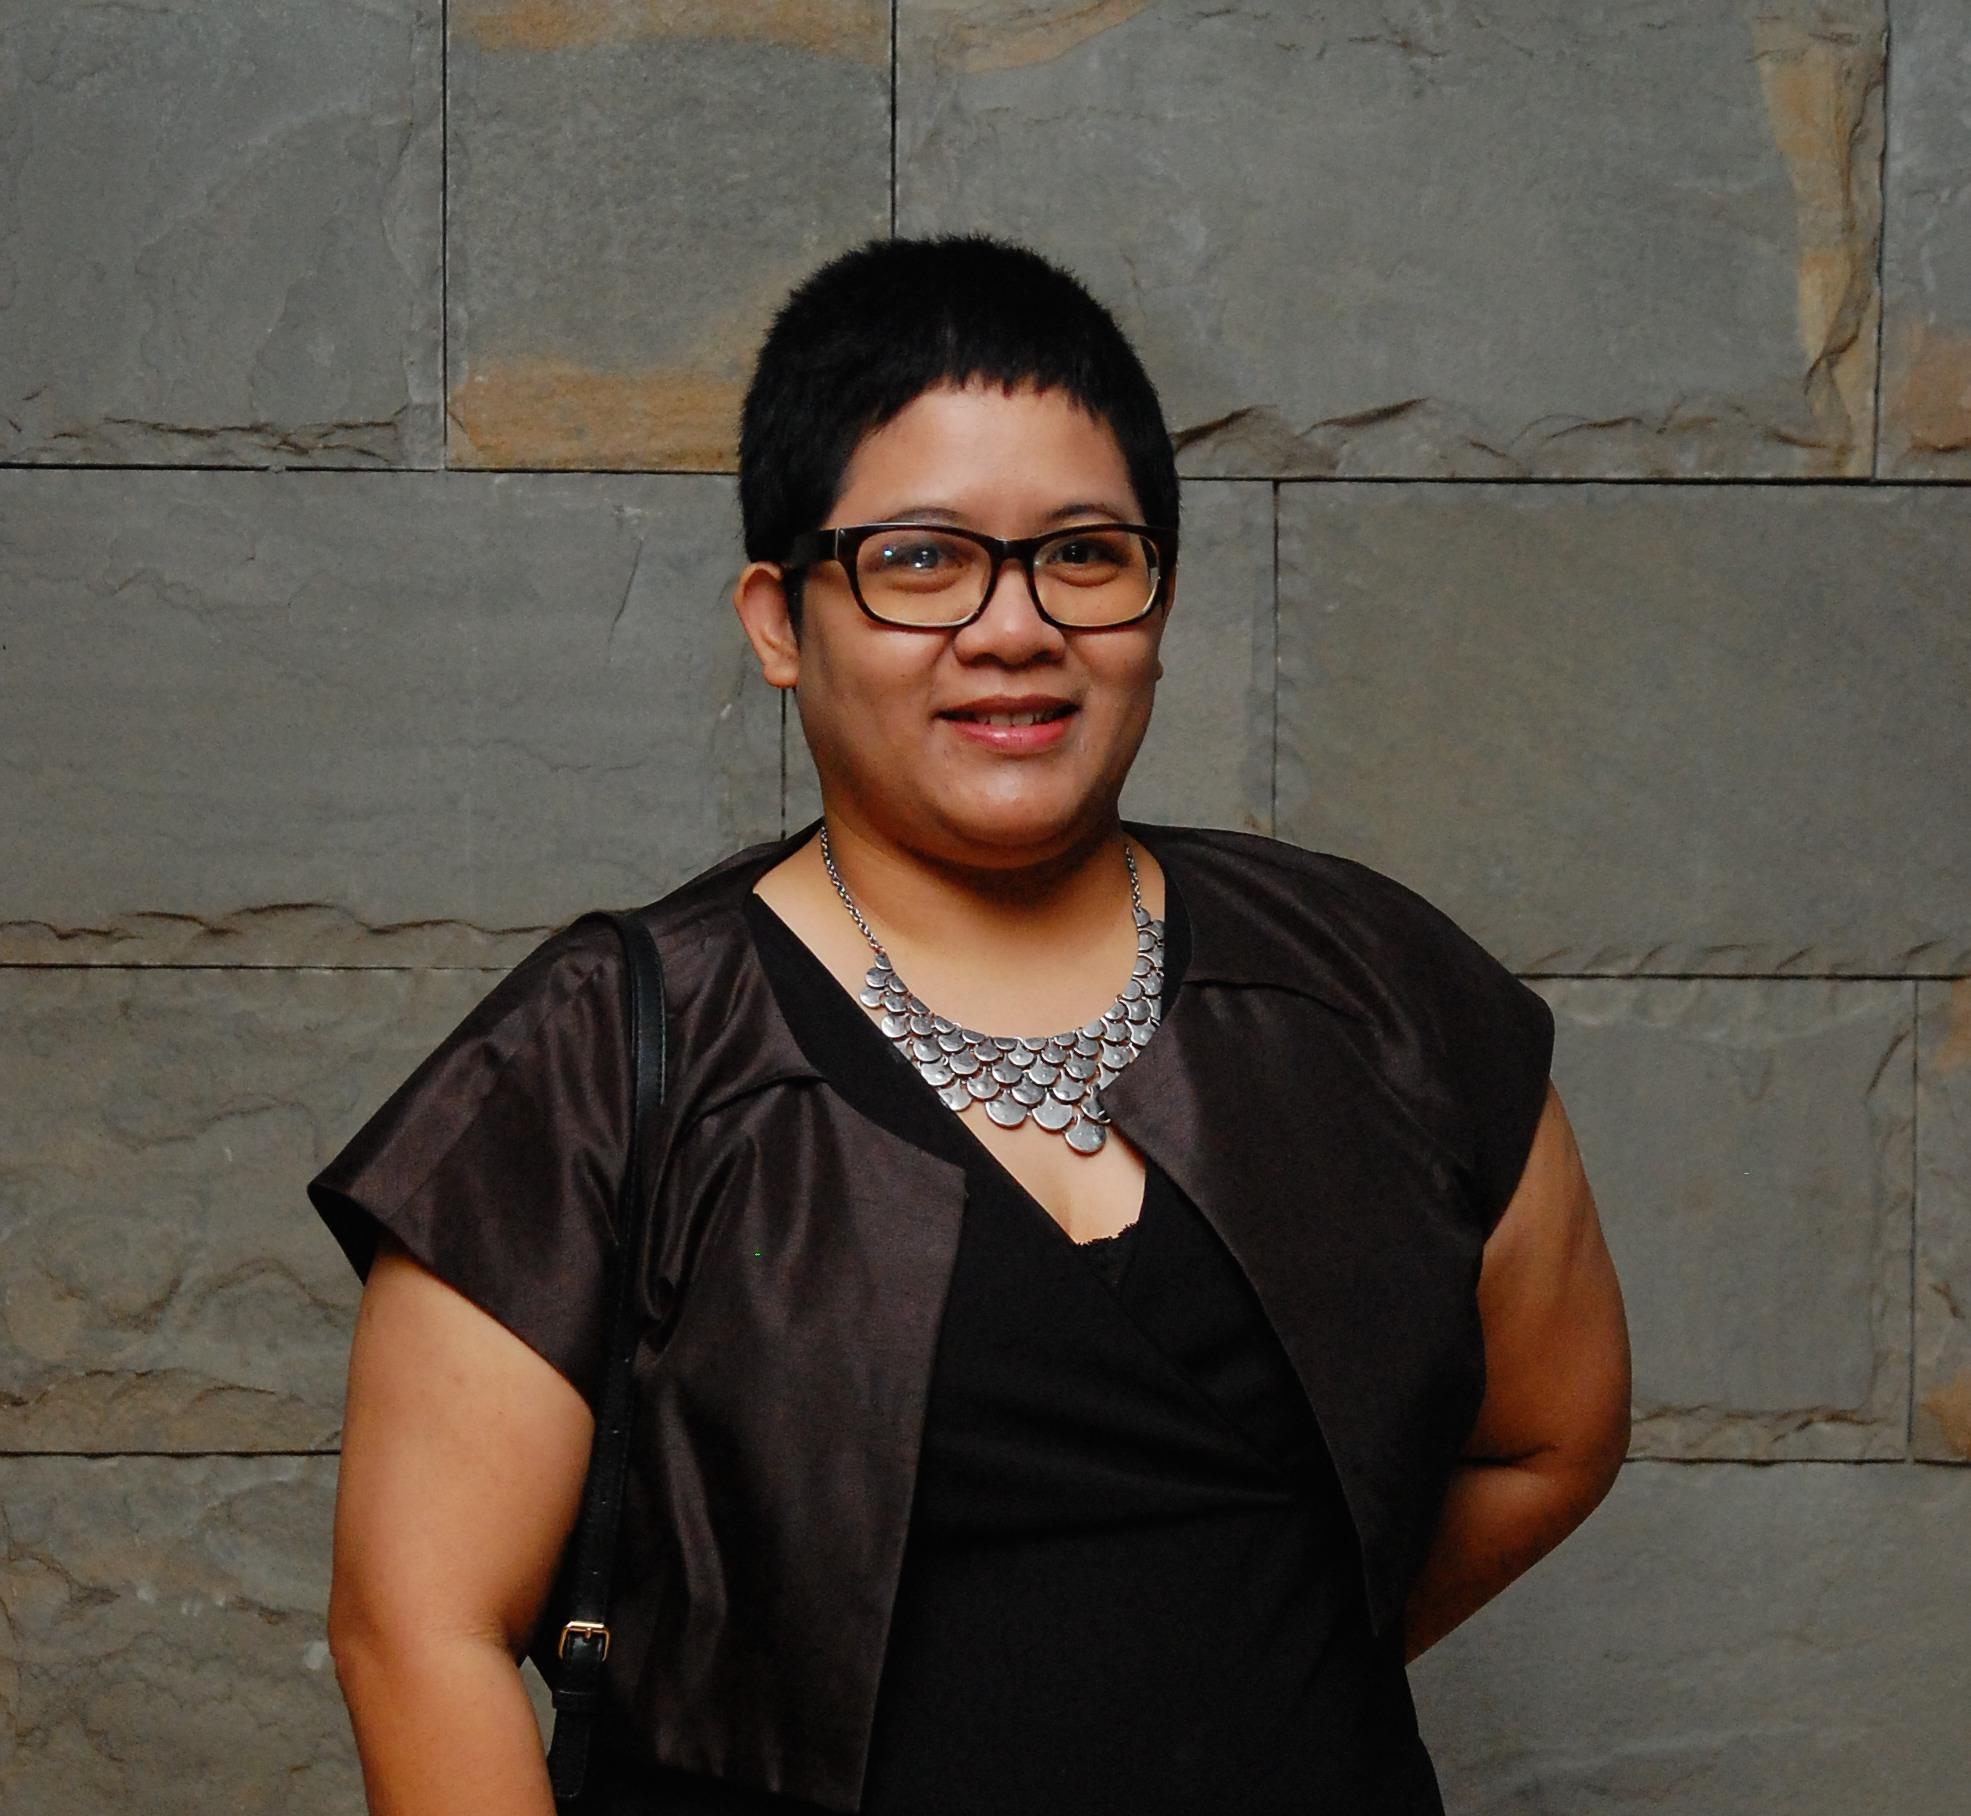 Misty Maitimoe Named Deputy Managing Director of Ogilvy Public Relations Indonesia